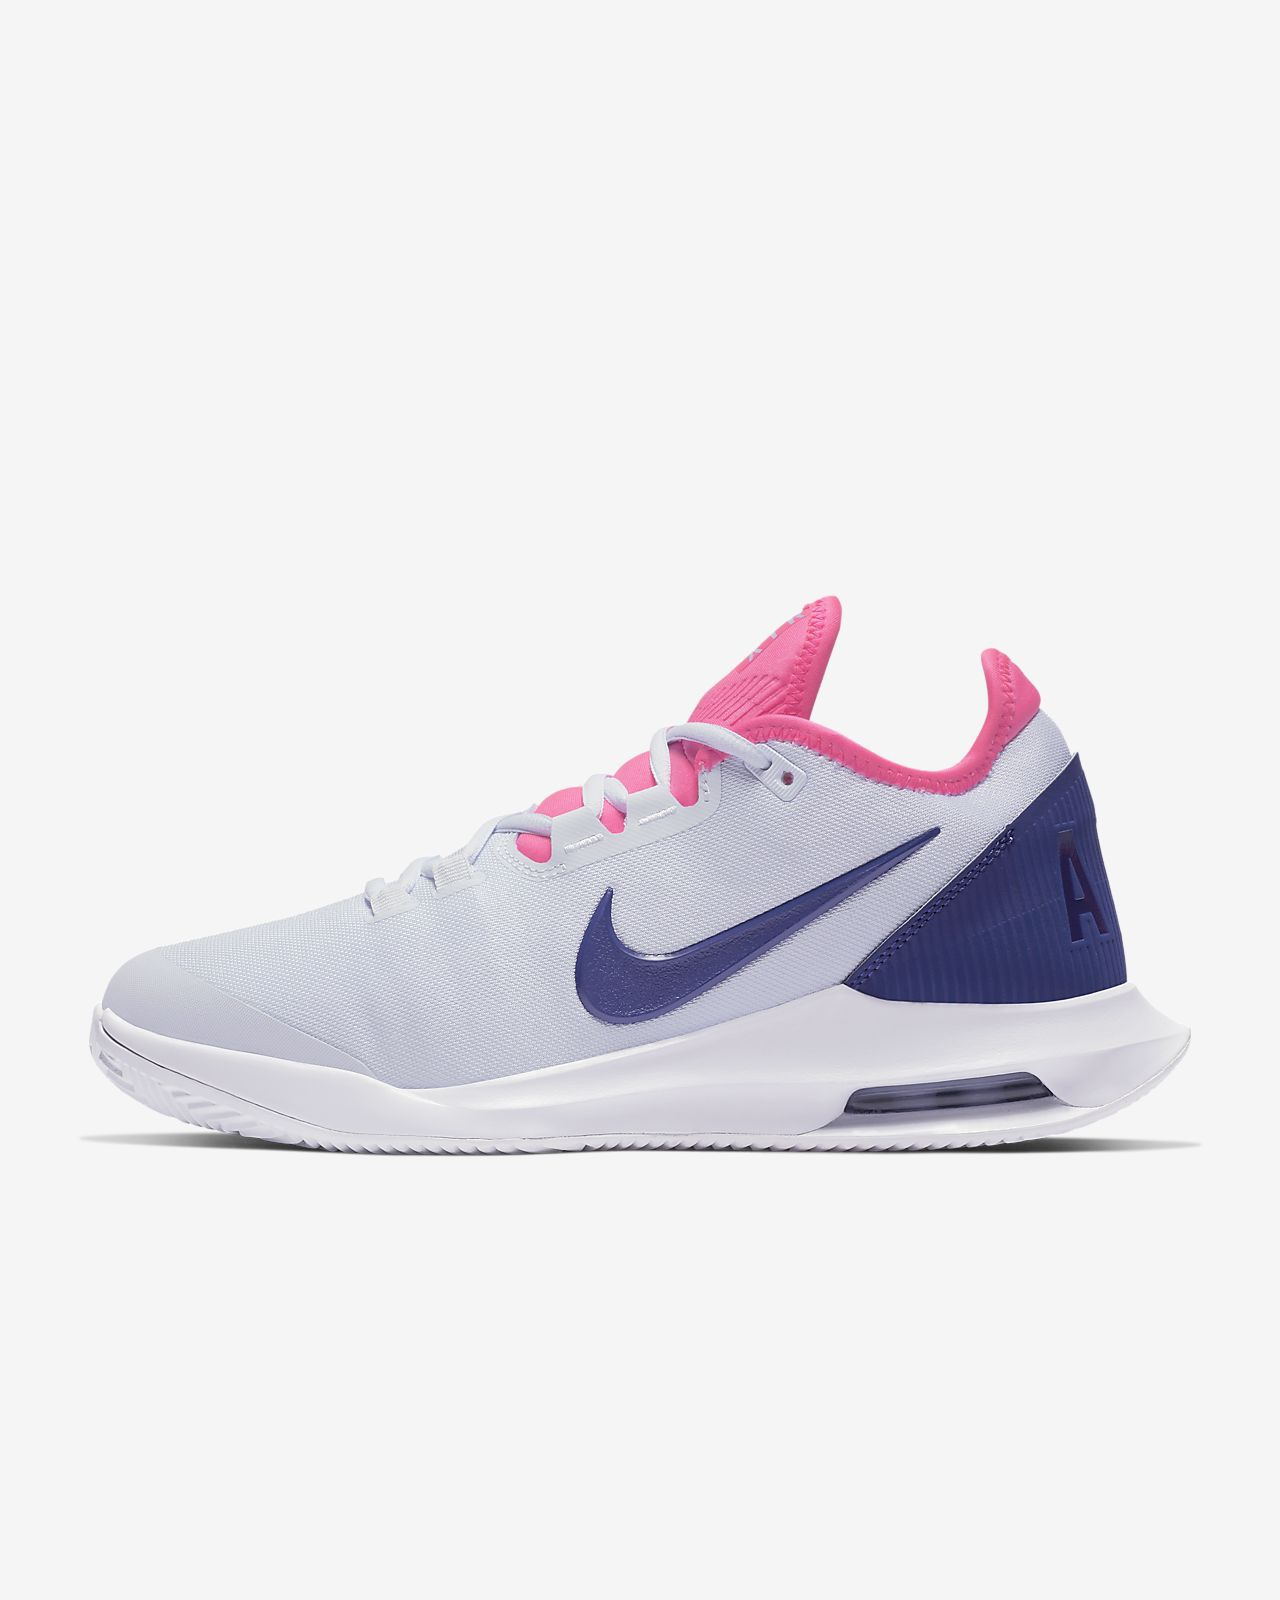 new product 3c0a6 d621e Calzado de tenis de mujer para polvo de ladrillo Nike Court Air Max Wildcard